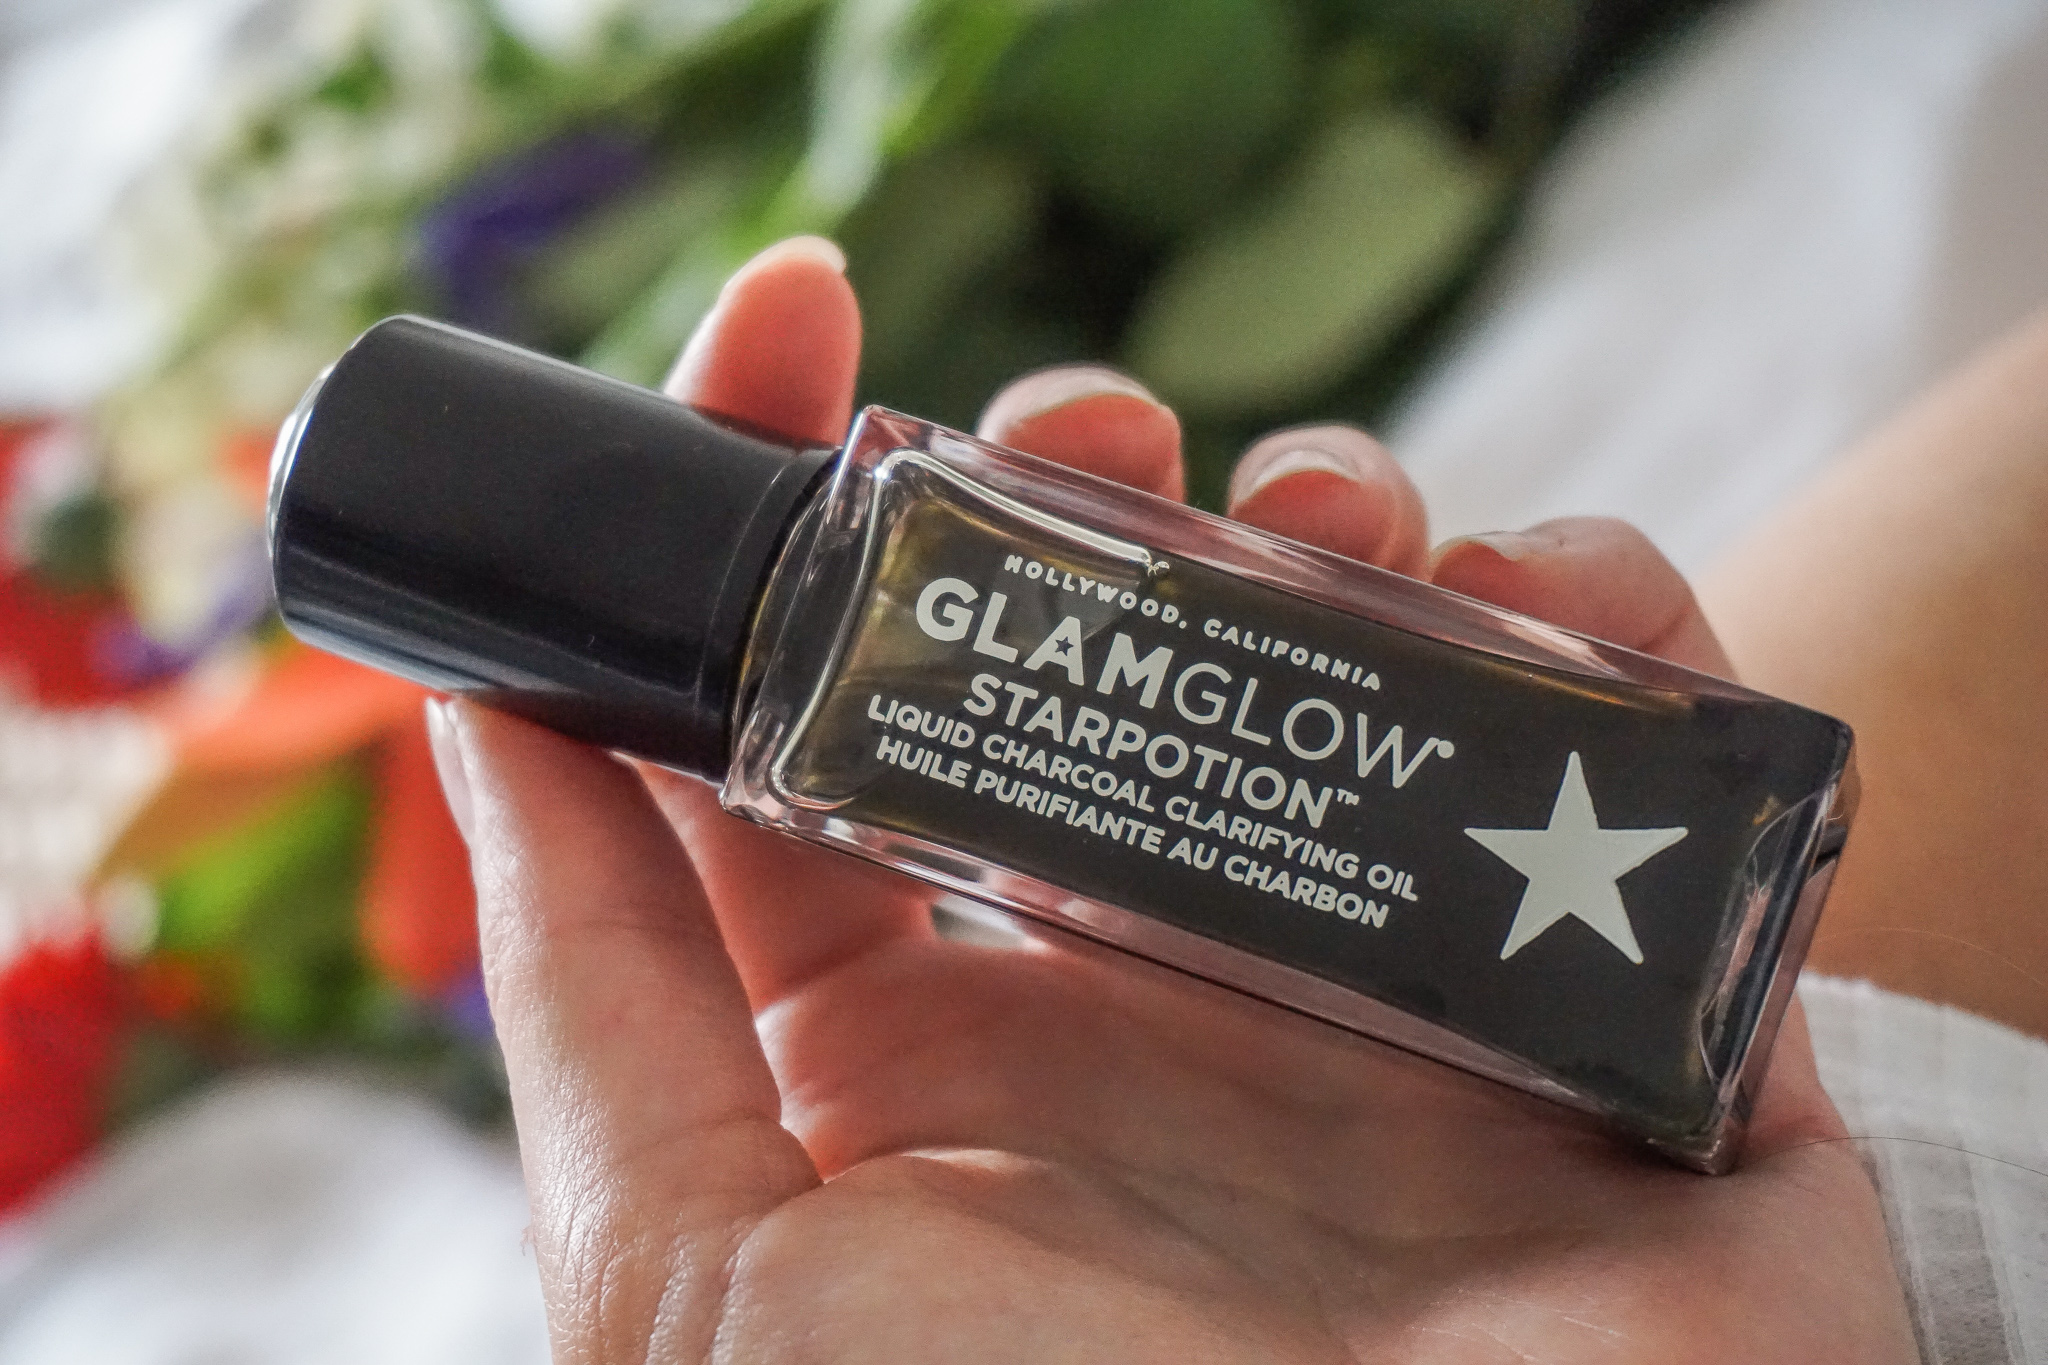 Glamglow Starpotion